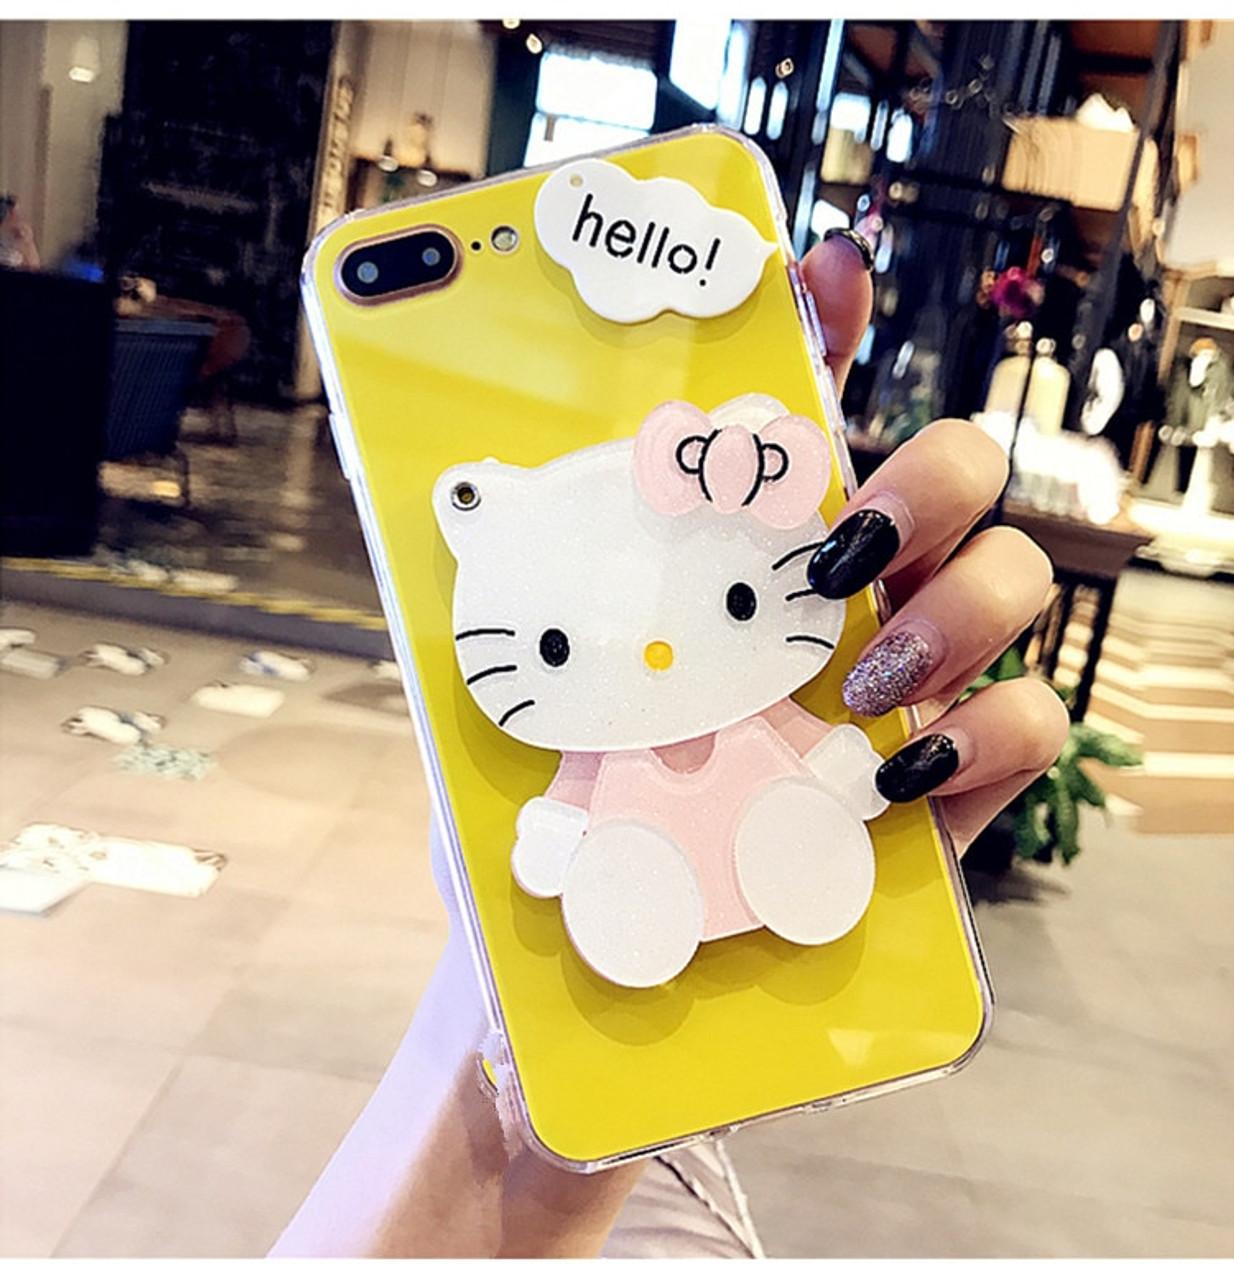 3f7de5c32 ... For iPhone 6 Case iPhone 7 8 Plus Cute Cartoon Hello Kitty Mirror Phone  Case for ...